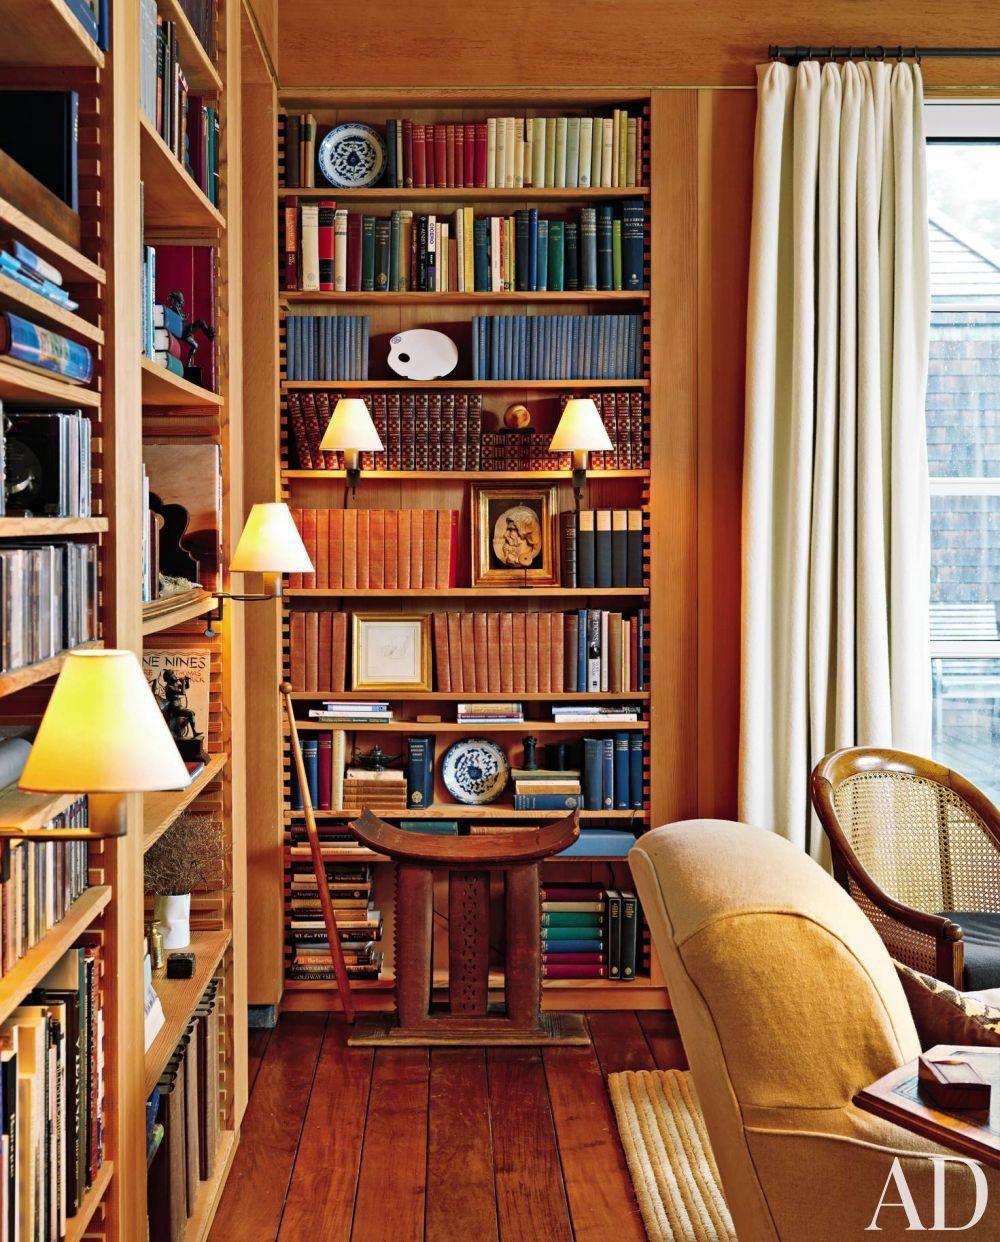 Architectural Digest: Architectural Digest Bookcases